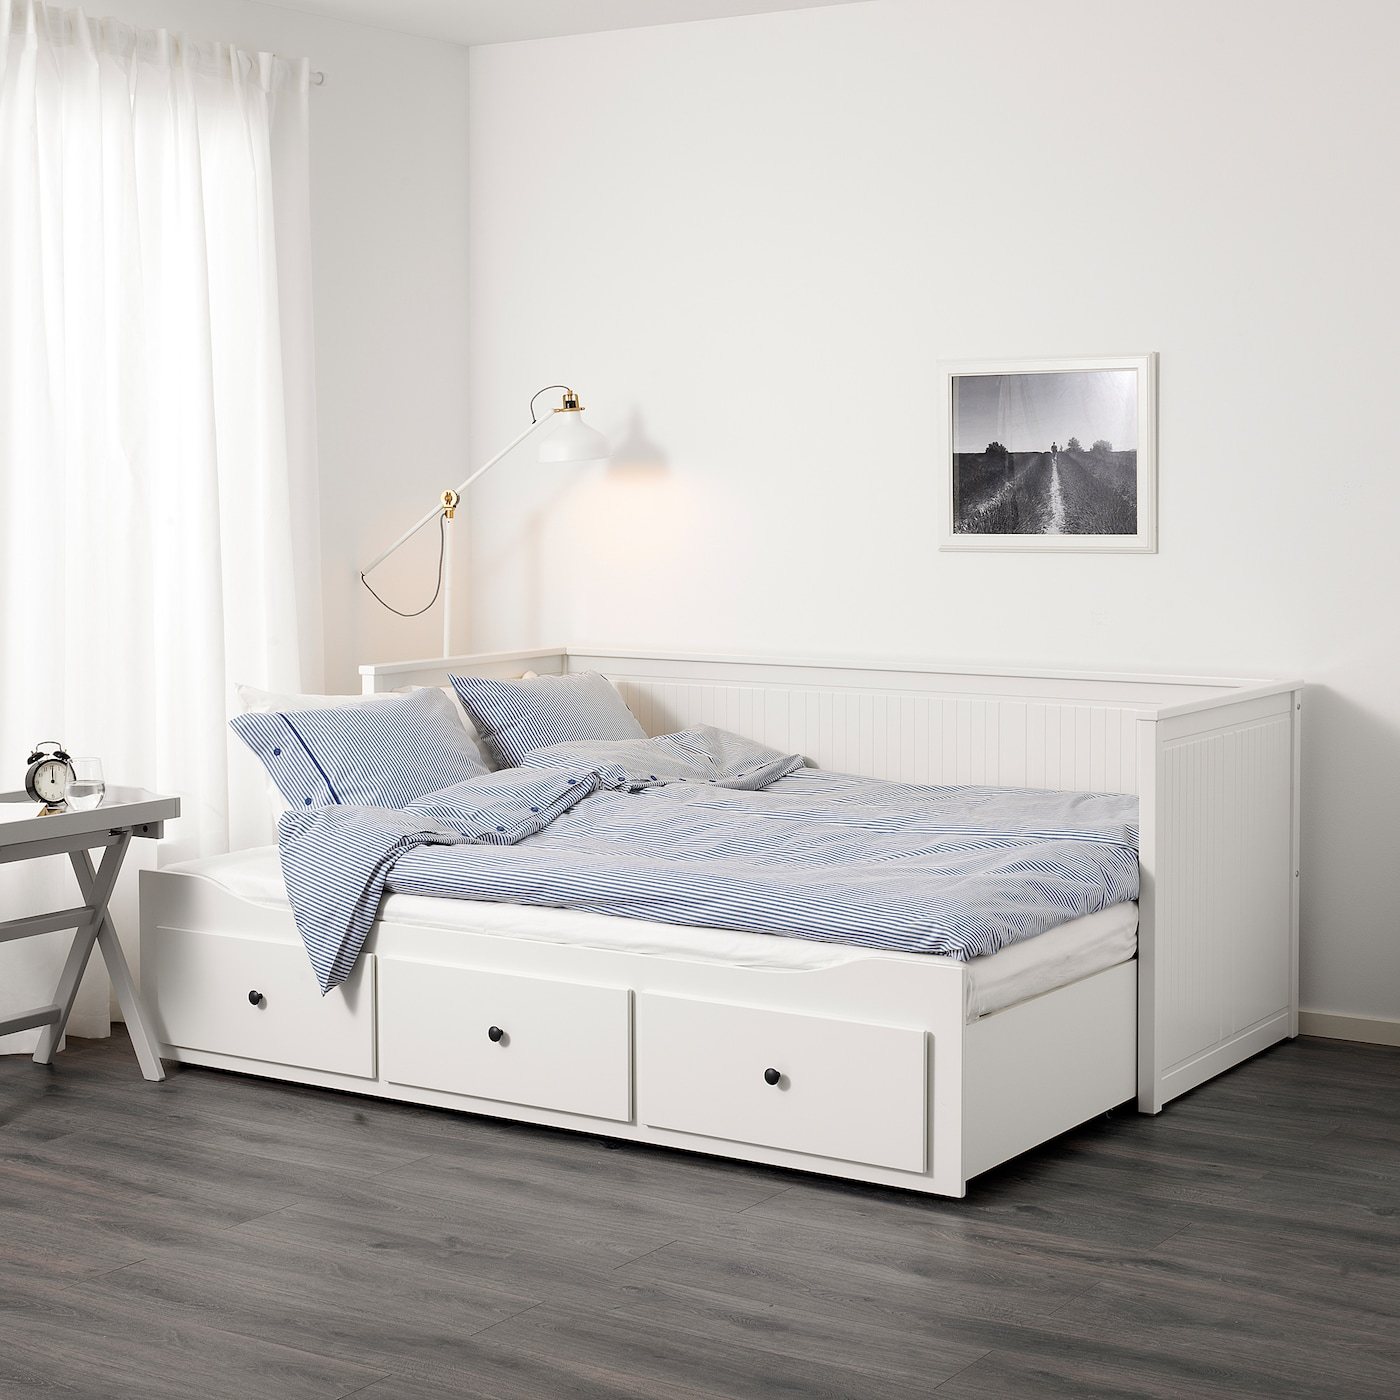 Bedbank En Logeerbed.Hemnes Day Bed Frame With 3 Drawers White Ikea